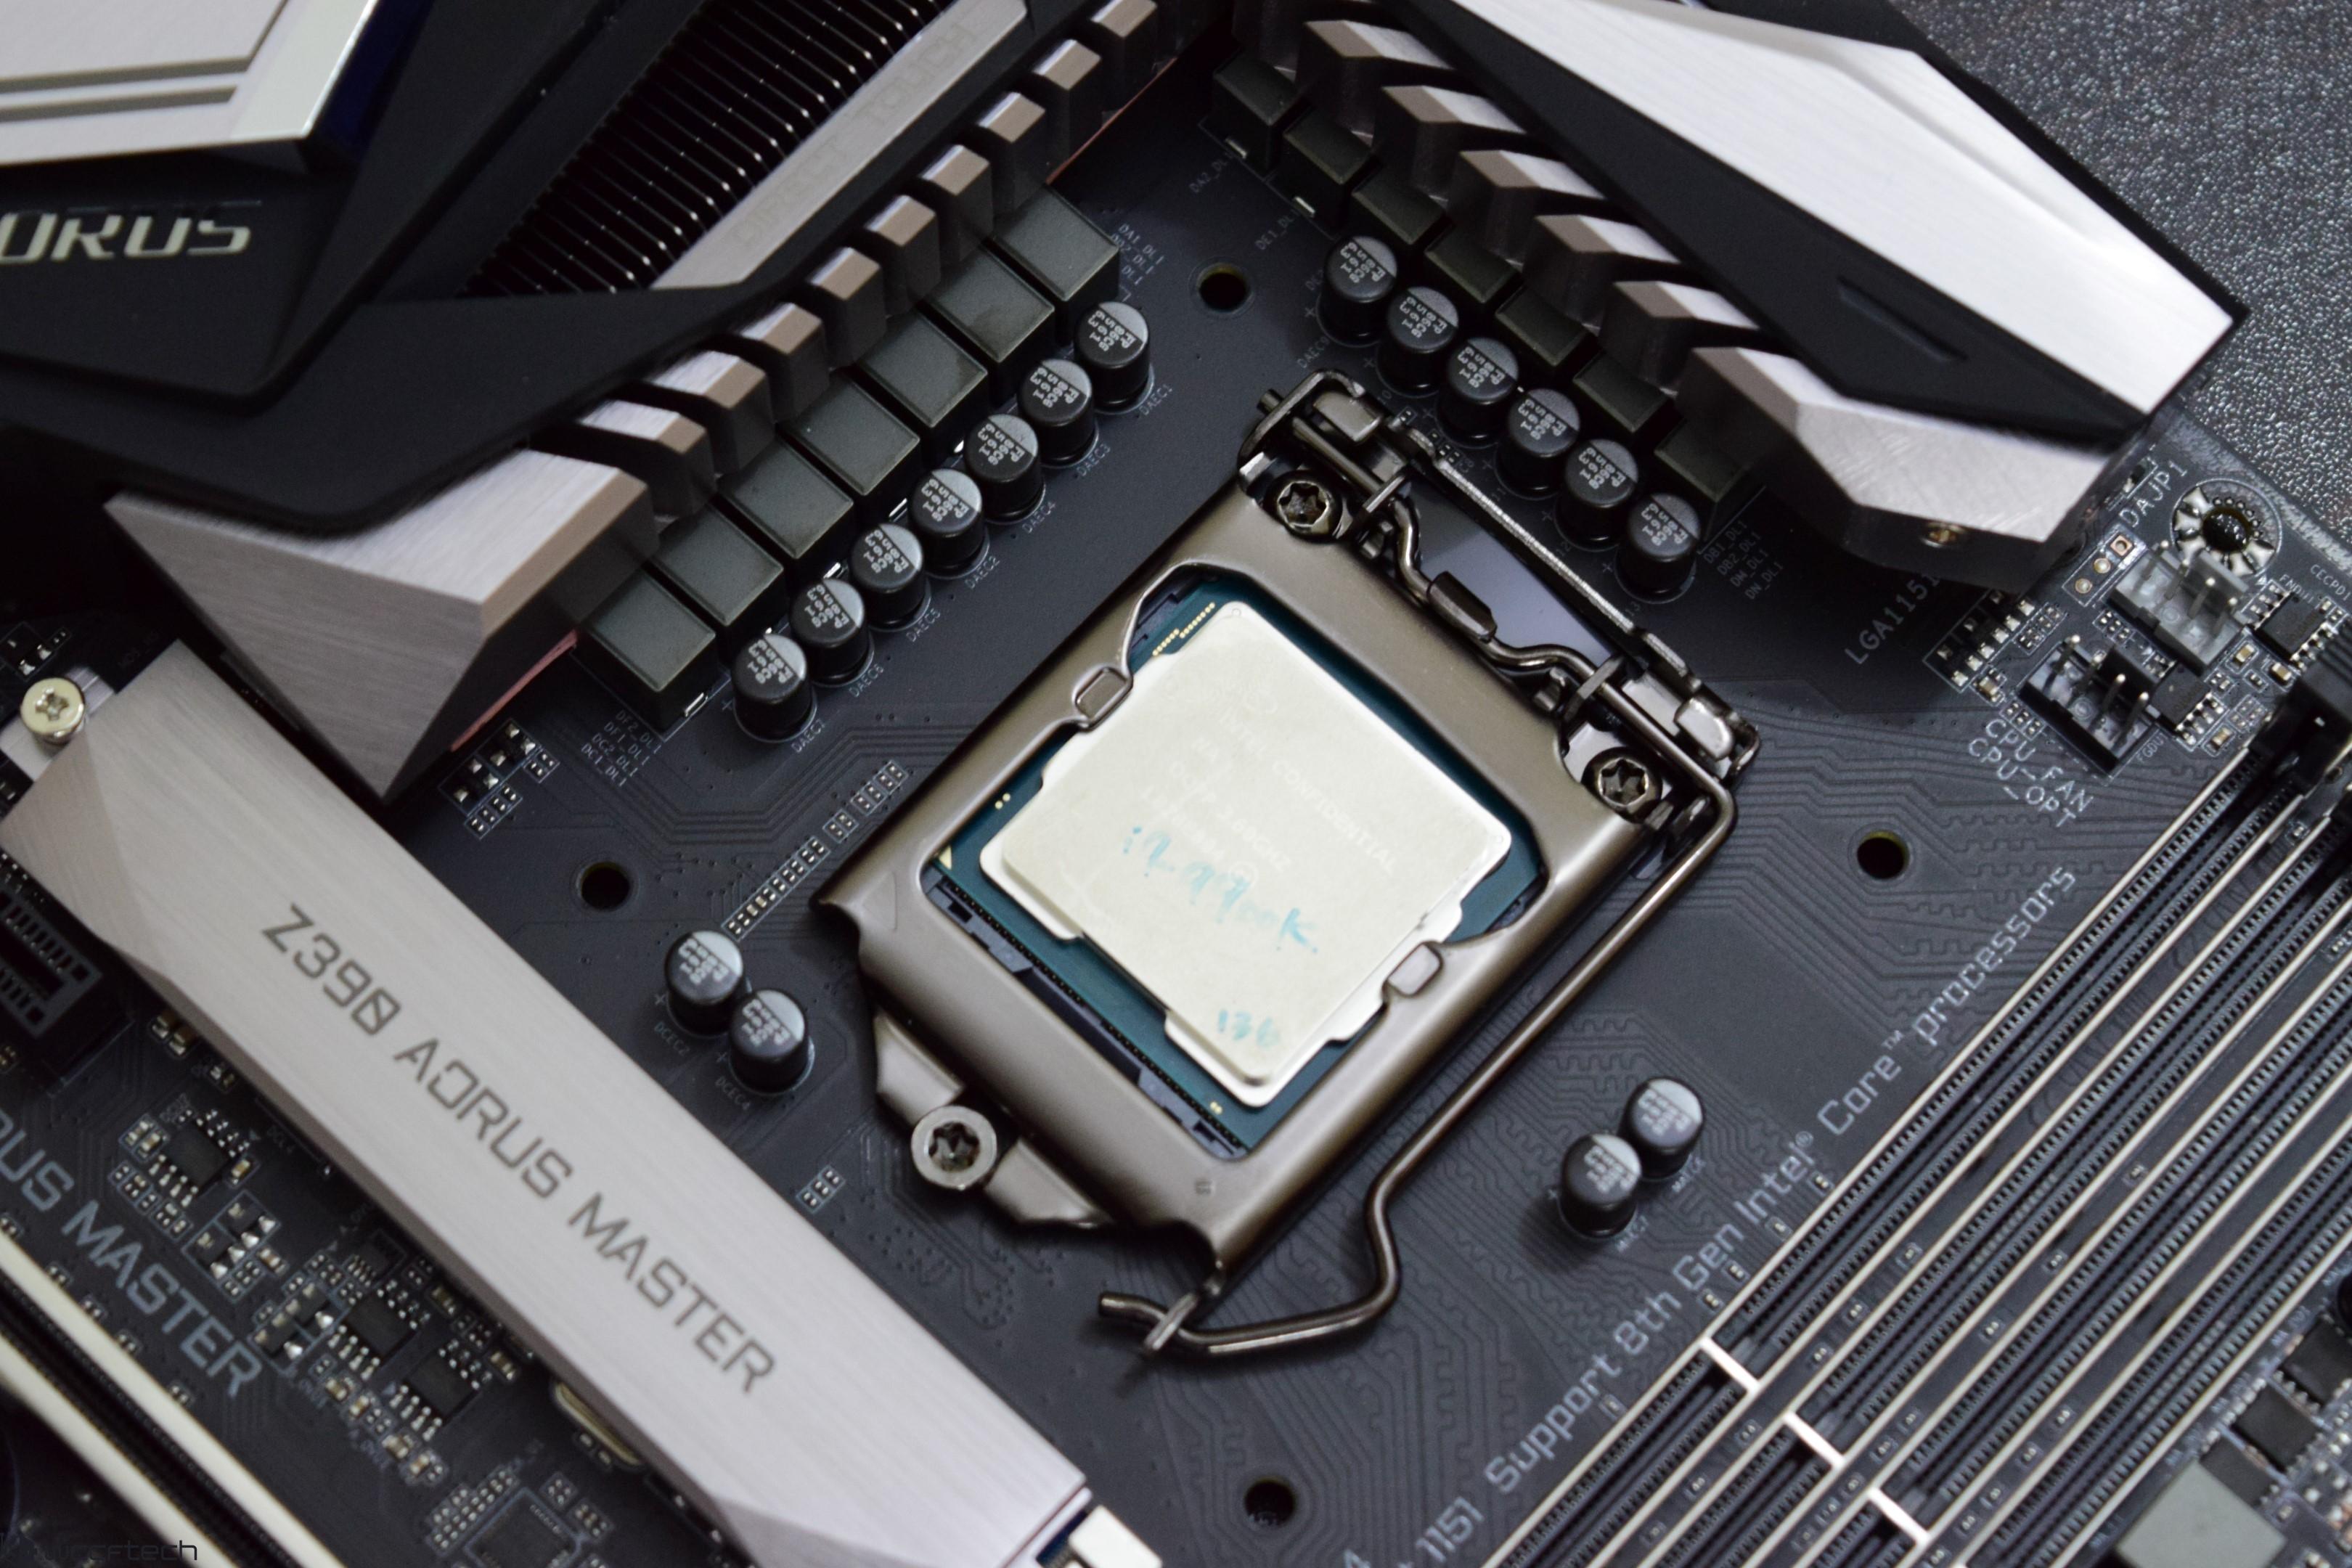 Intel Core i9-9900K 8 Core CPU Review on AORUS Z390 Master